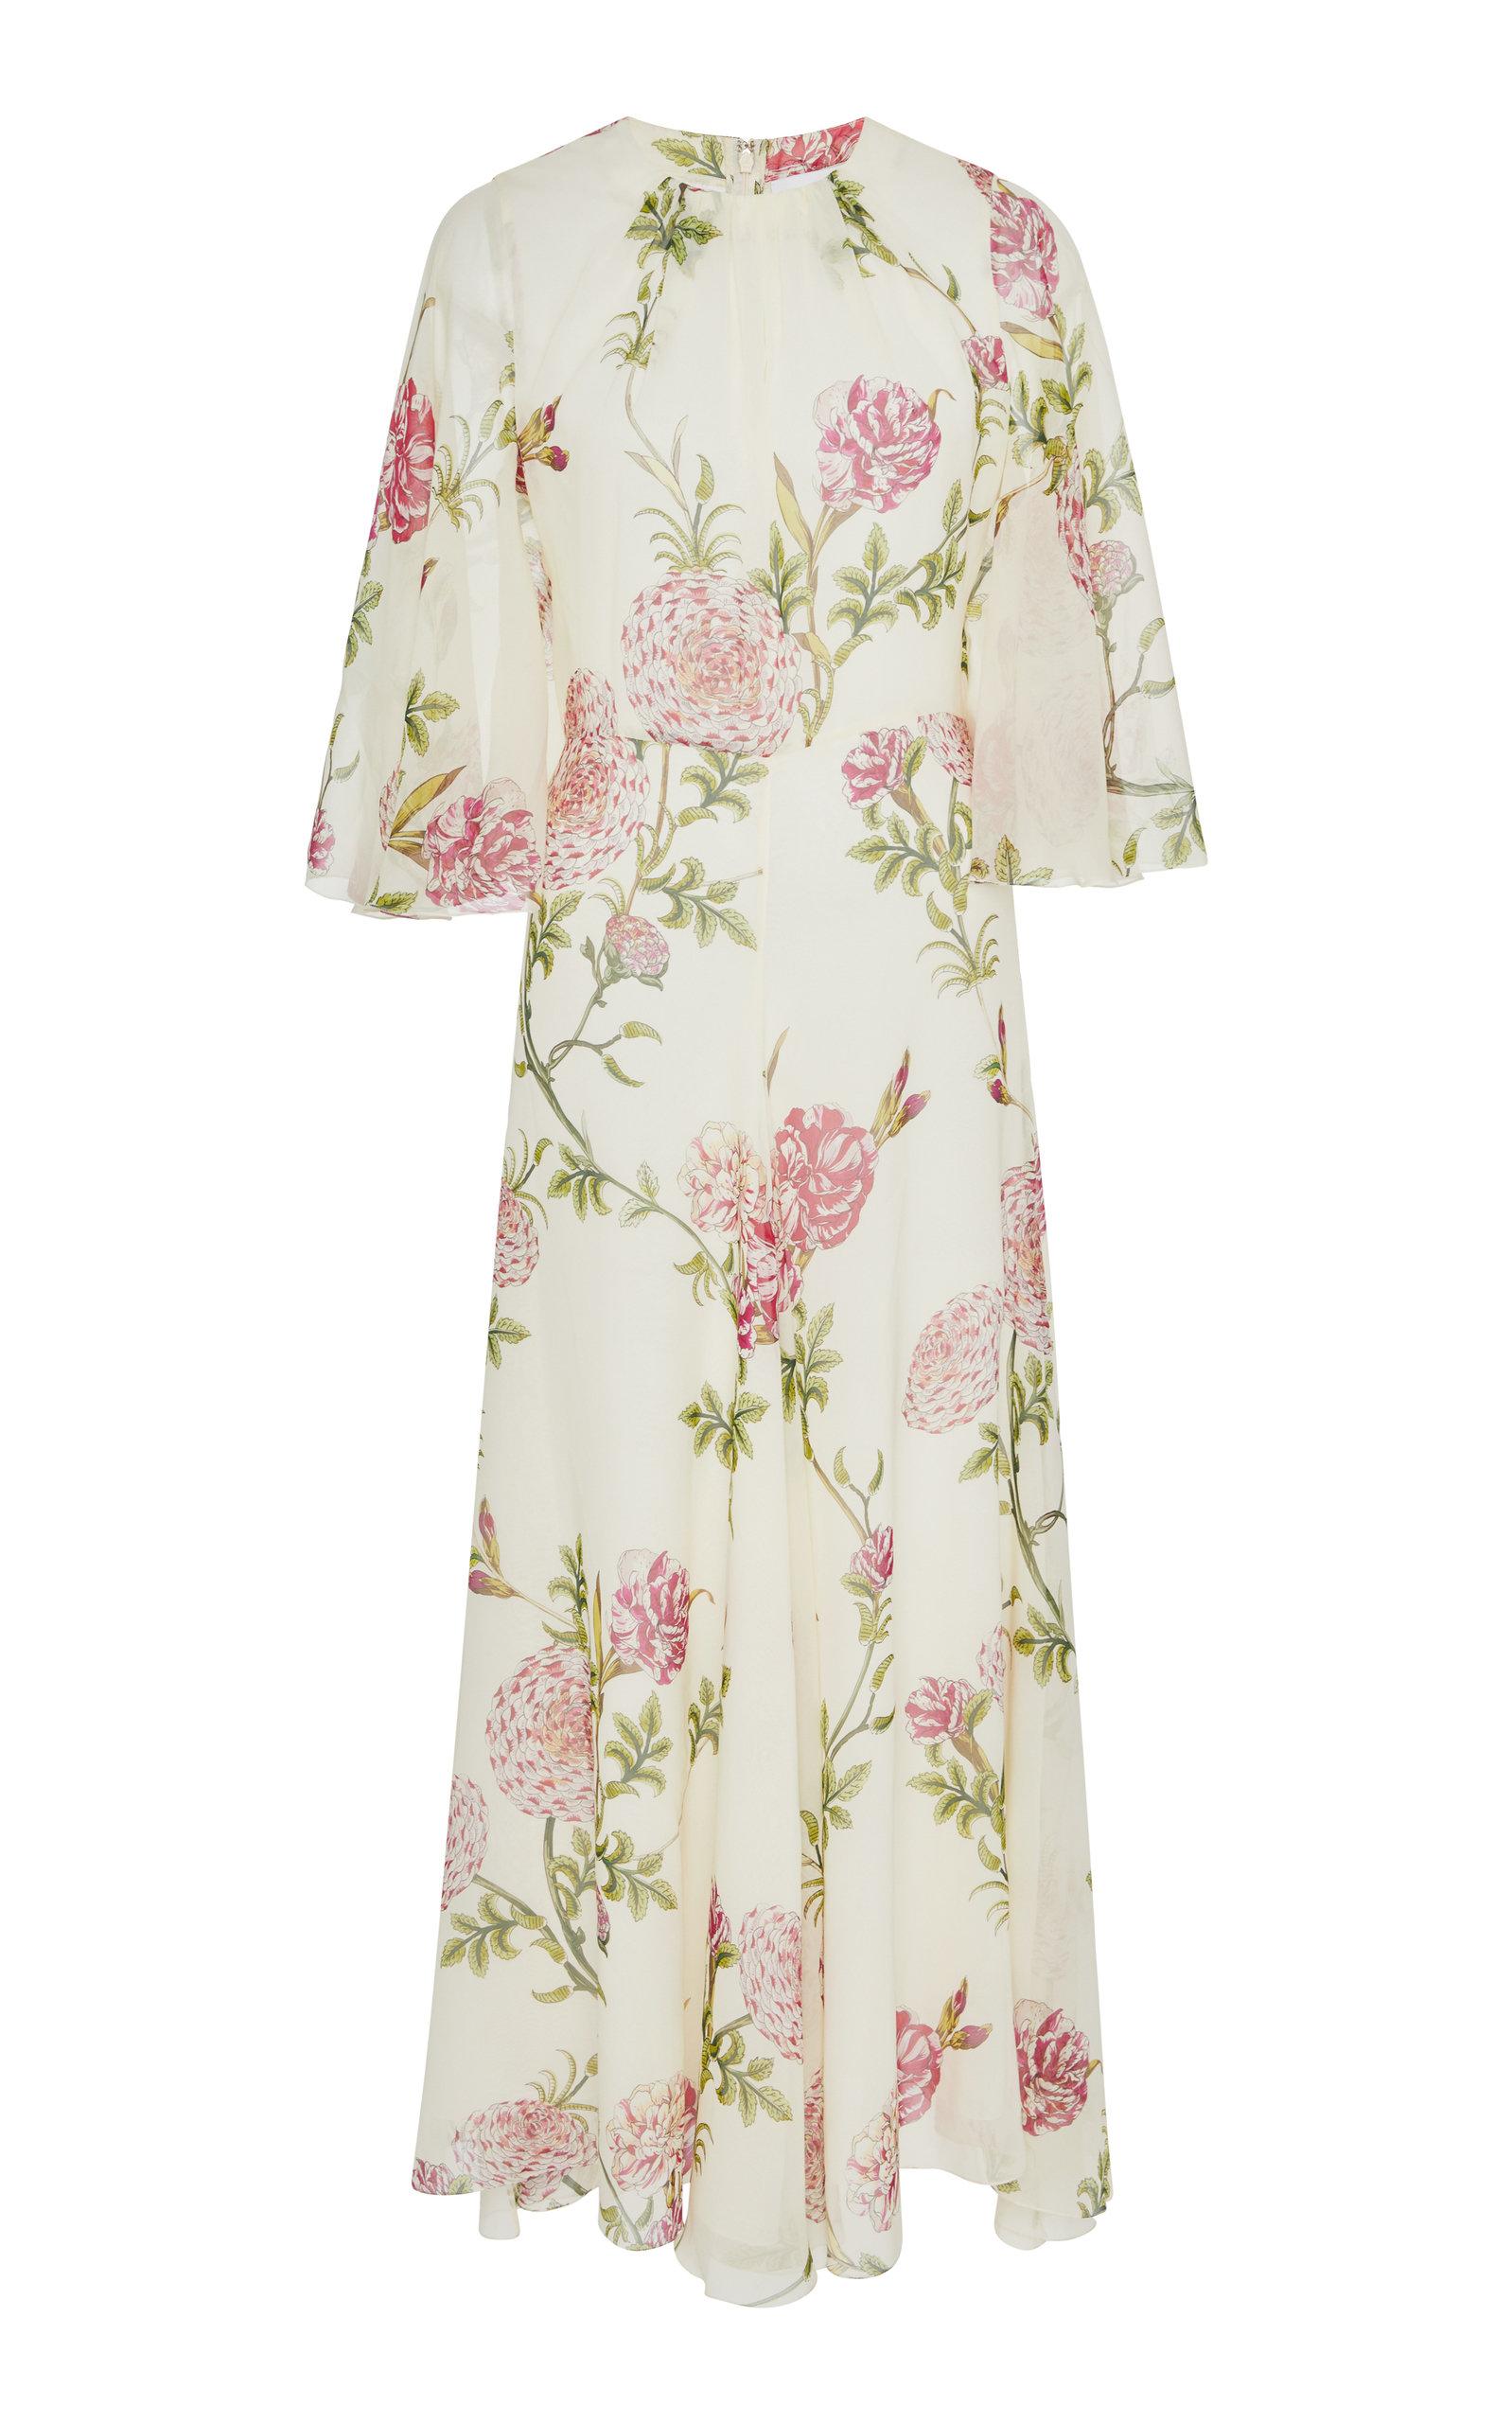 GIAMBATTISTA VALLI | Giambattista Valli Floral-Print Silk-Chiffon Midi Dress | Goxip